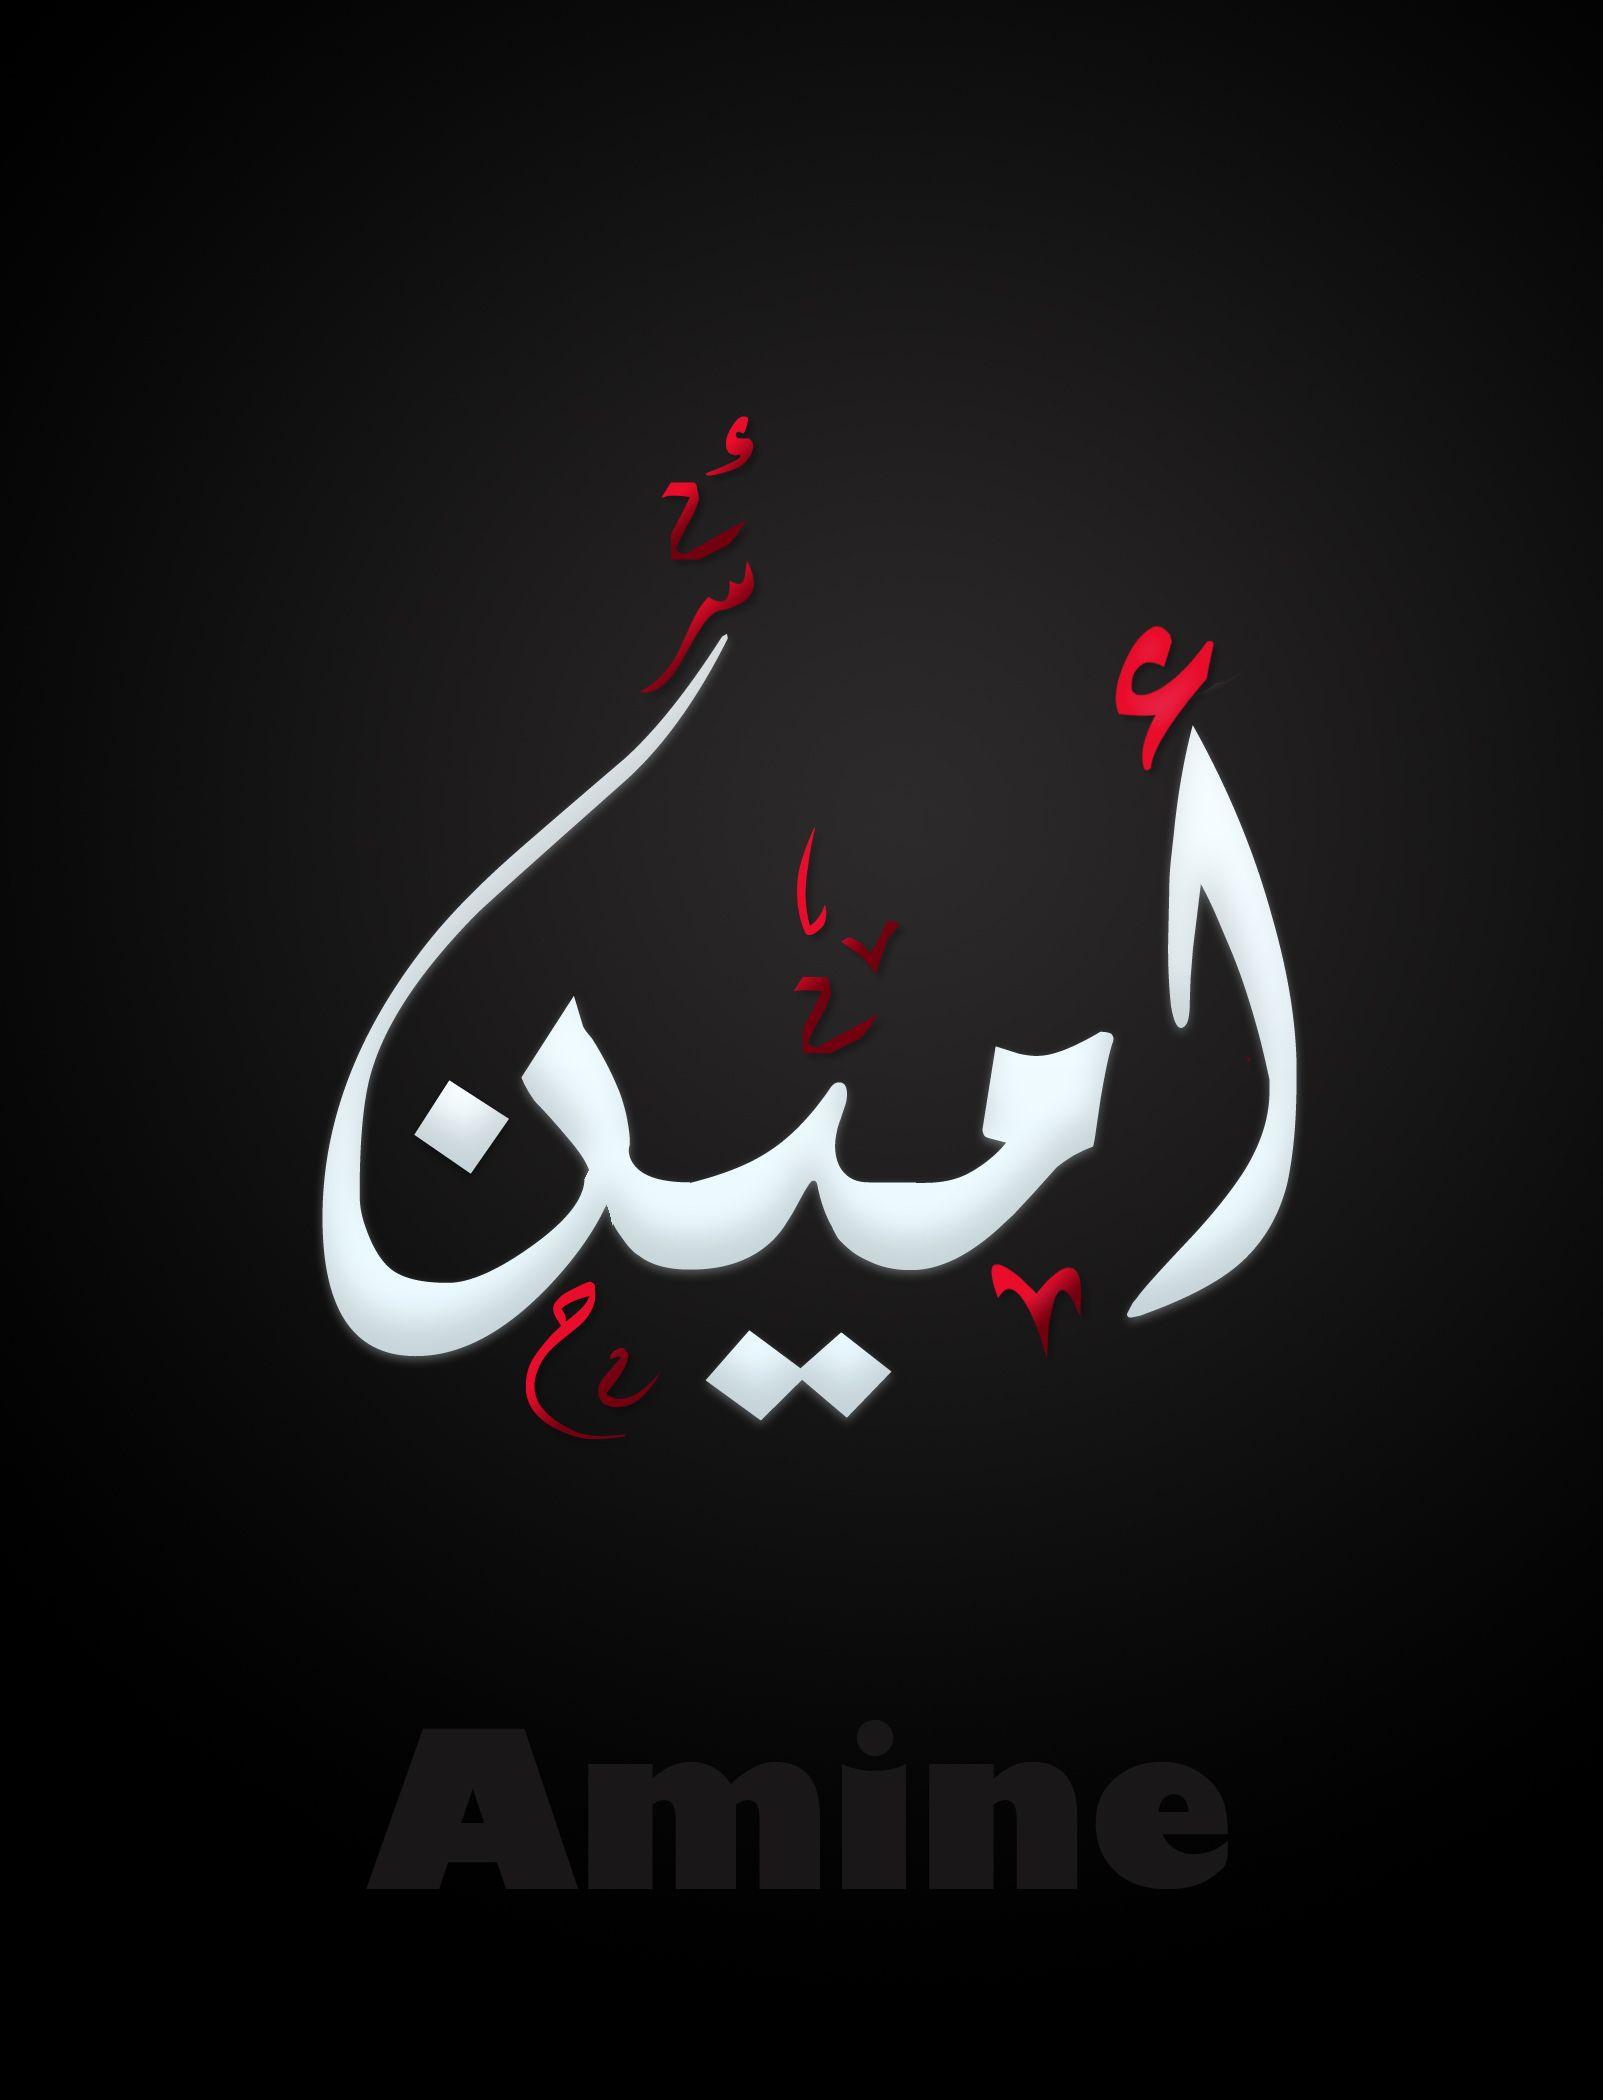 Amine امين Arabic Calligraphy Art Calligraphy Art Arabic Calligraphy